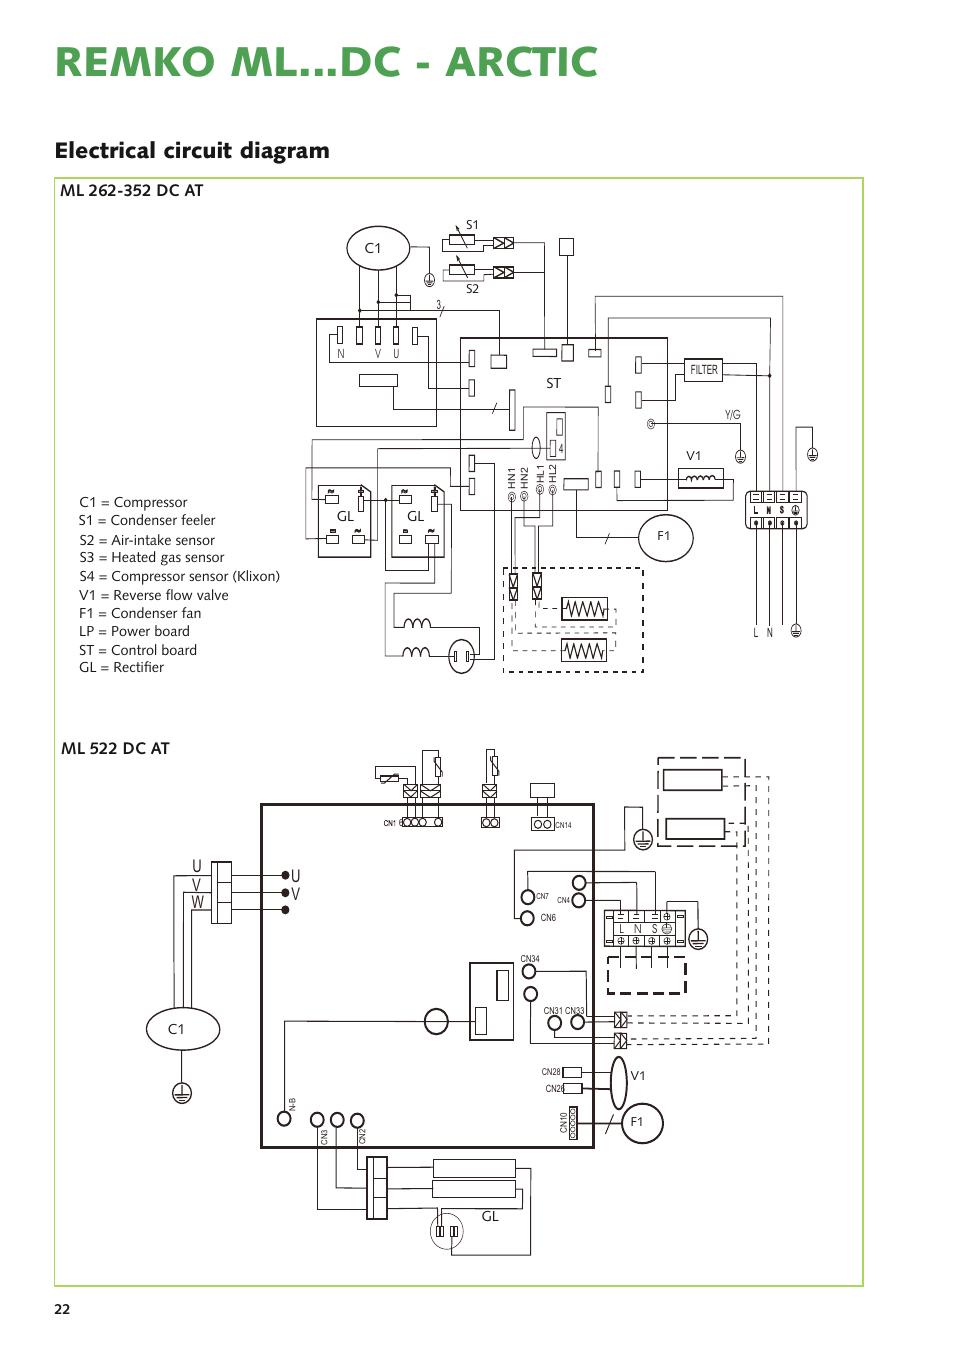 Remko Mldc Arctic Electrical Circuit Diagram Uv W Ml L Filter 262 Dc User Manual Page 22 32